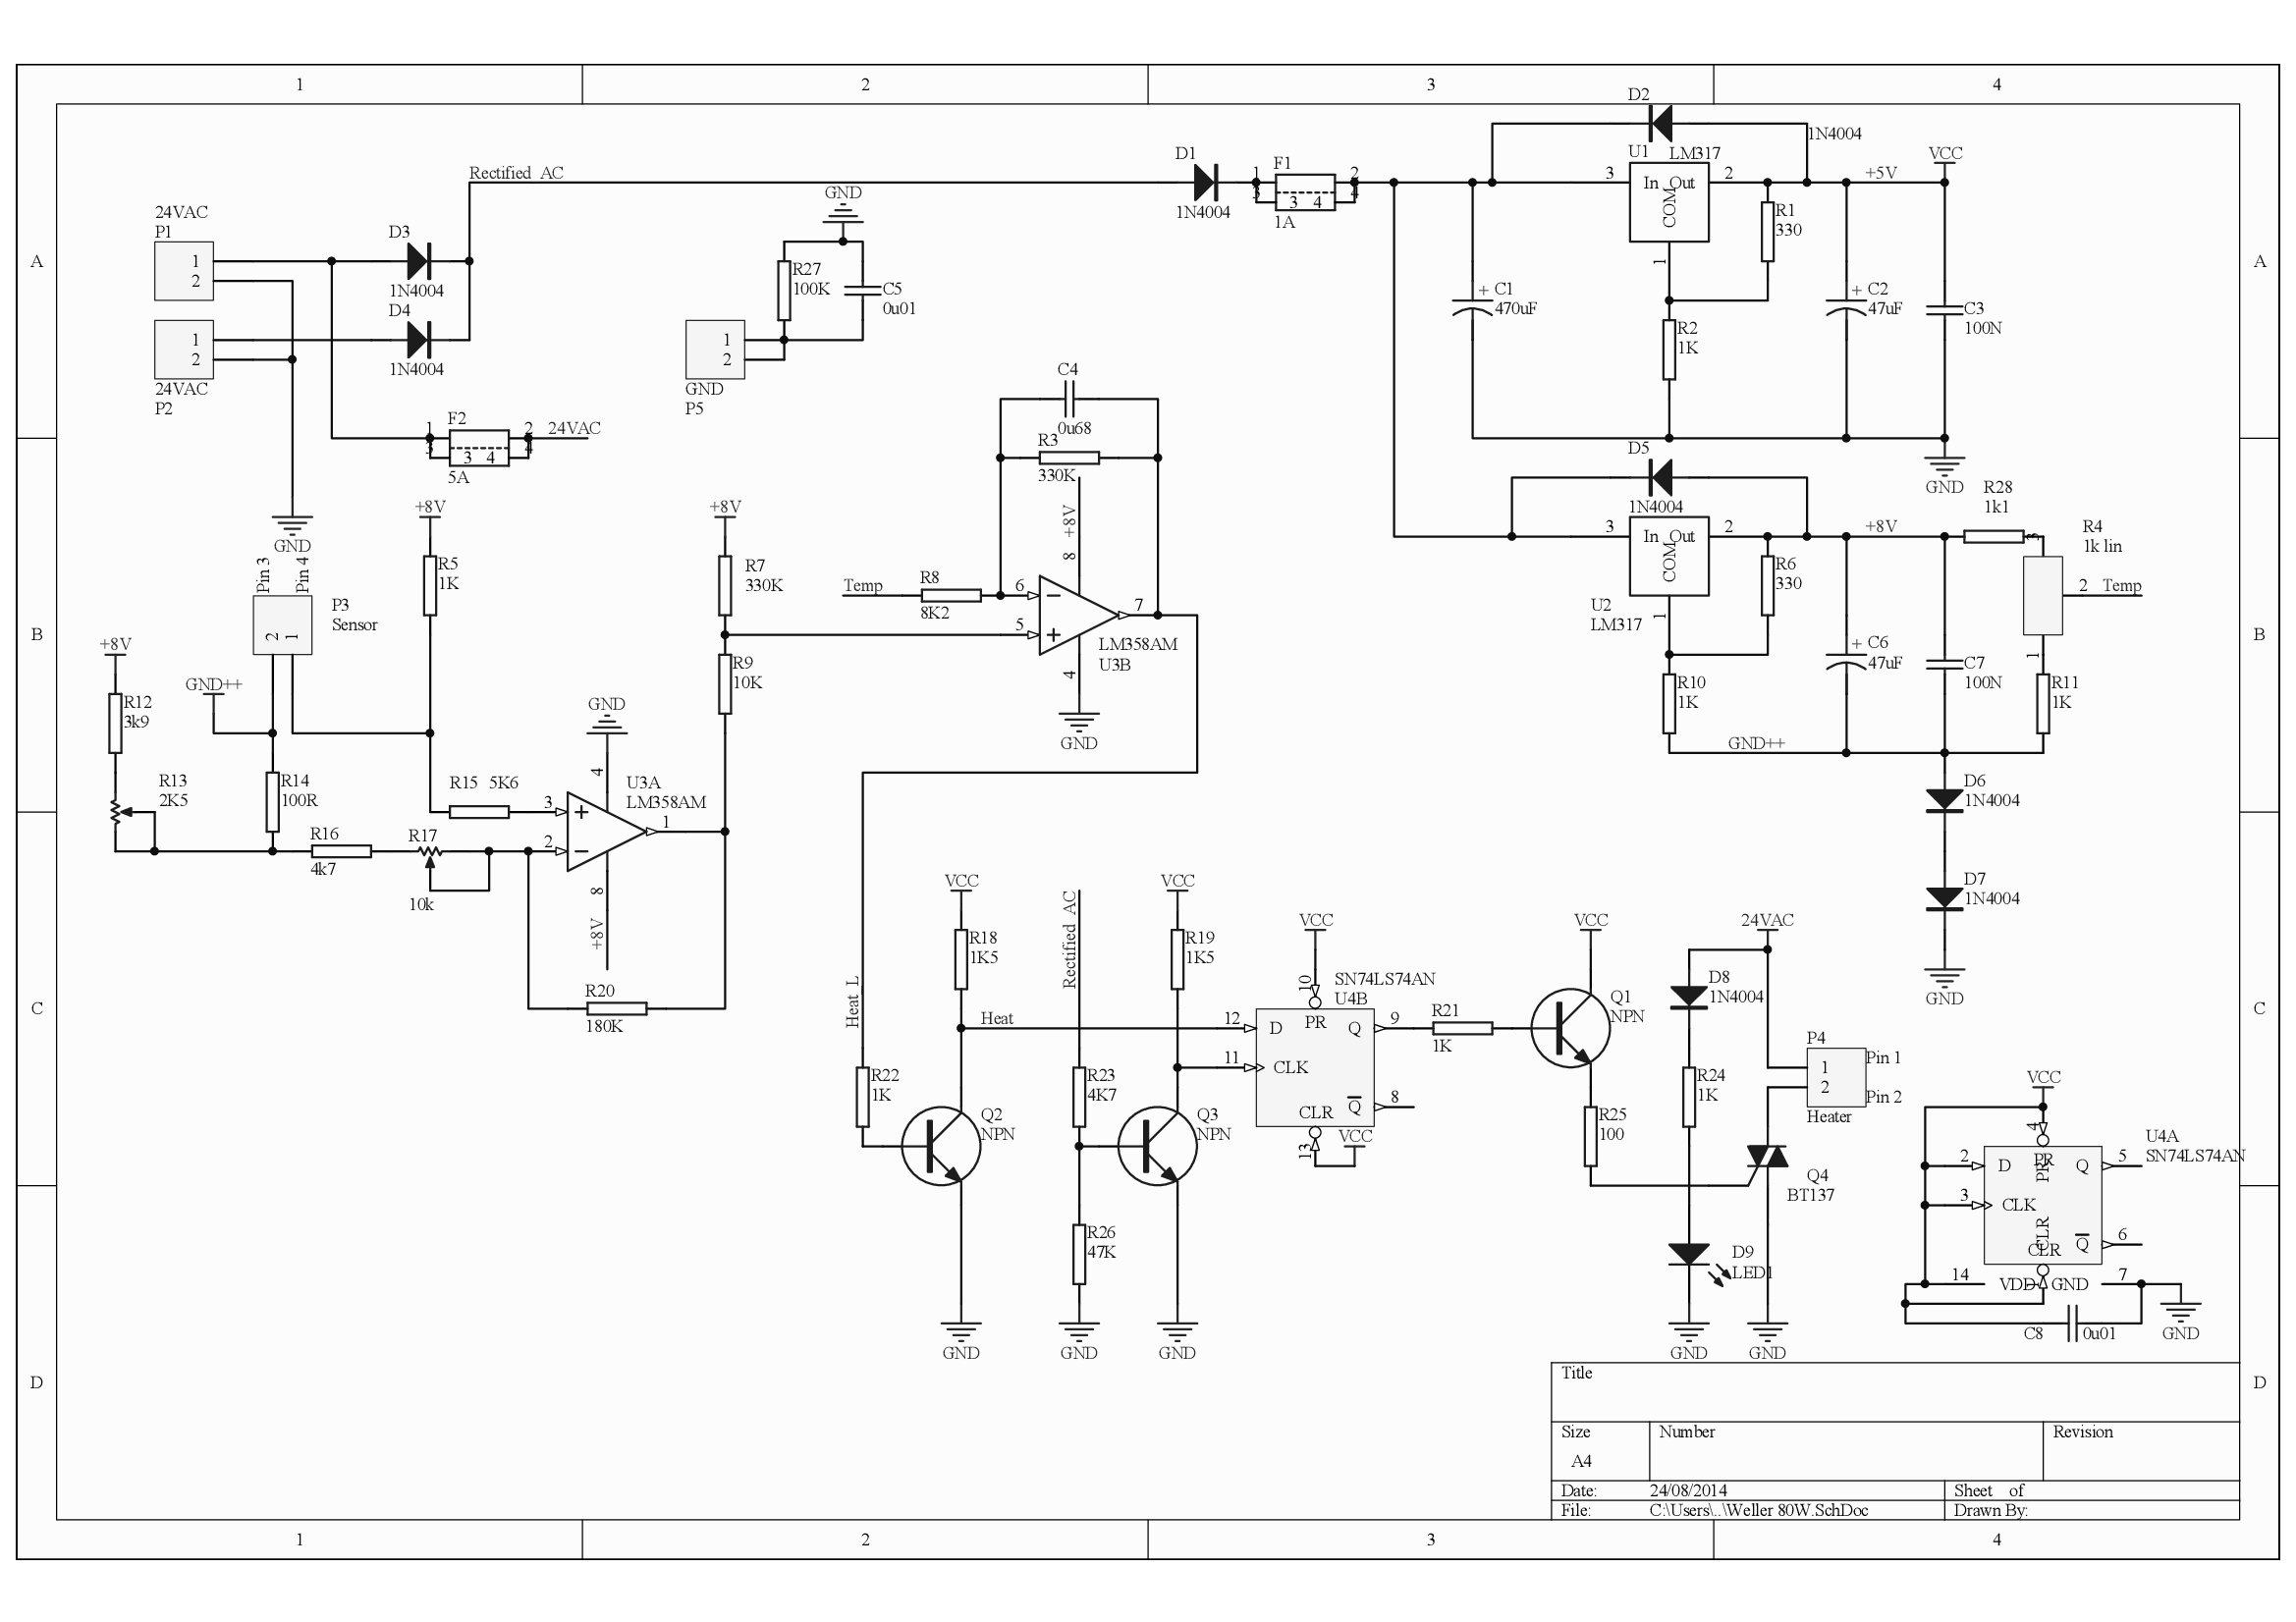 Honda 185s Wiring Diagram - Wiring Diagrams on